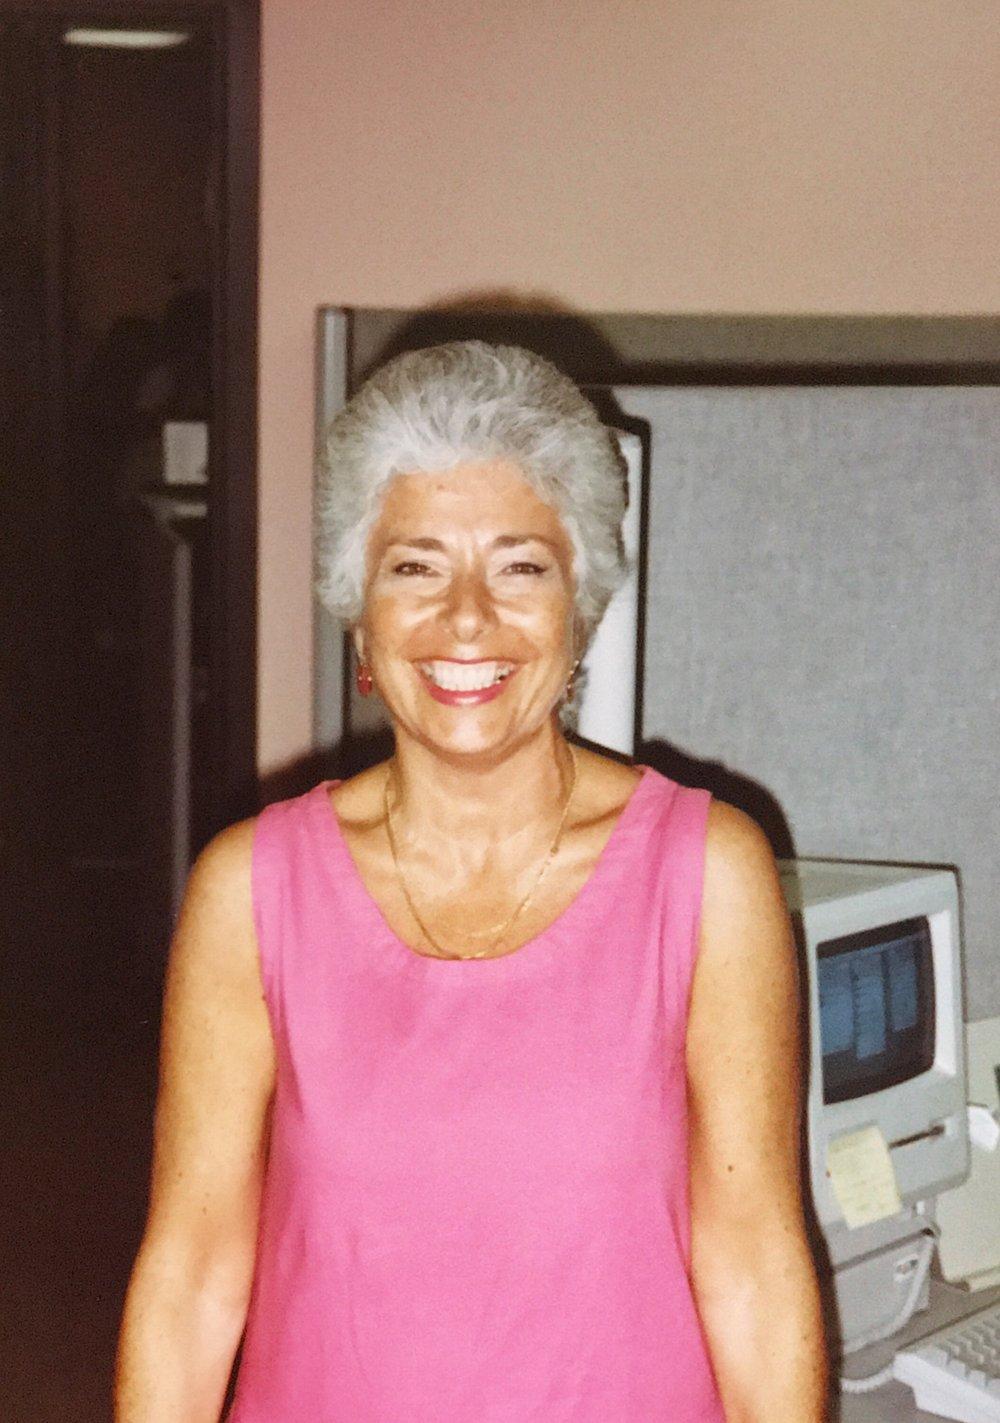 Suzanne Jeansonne